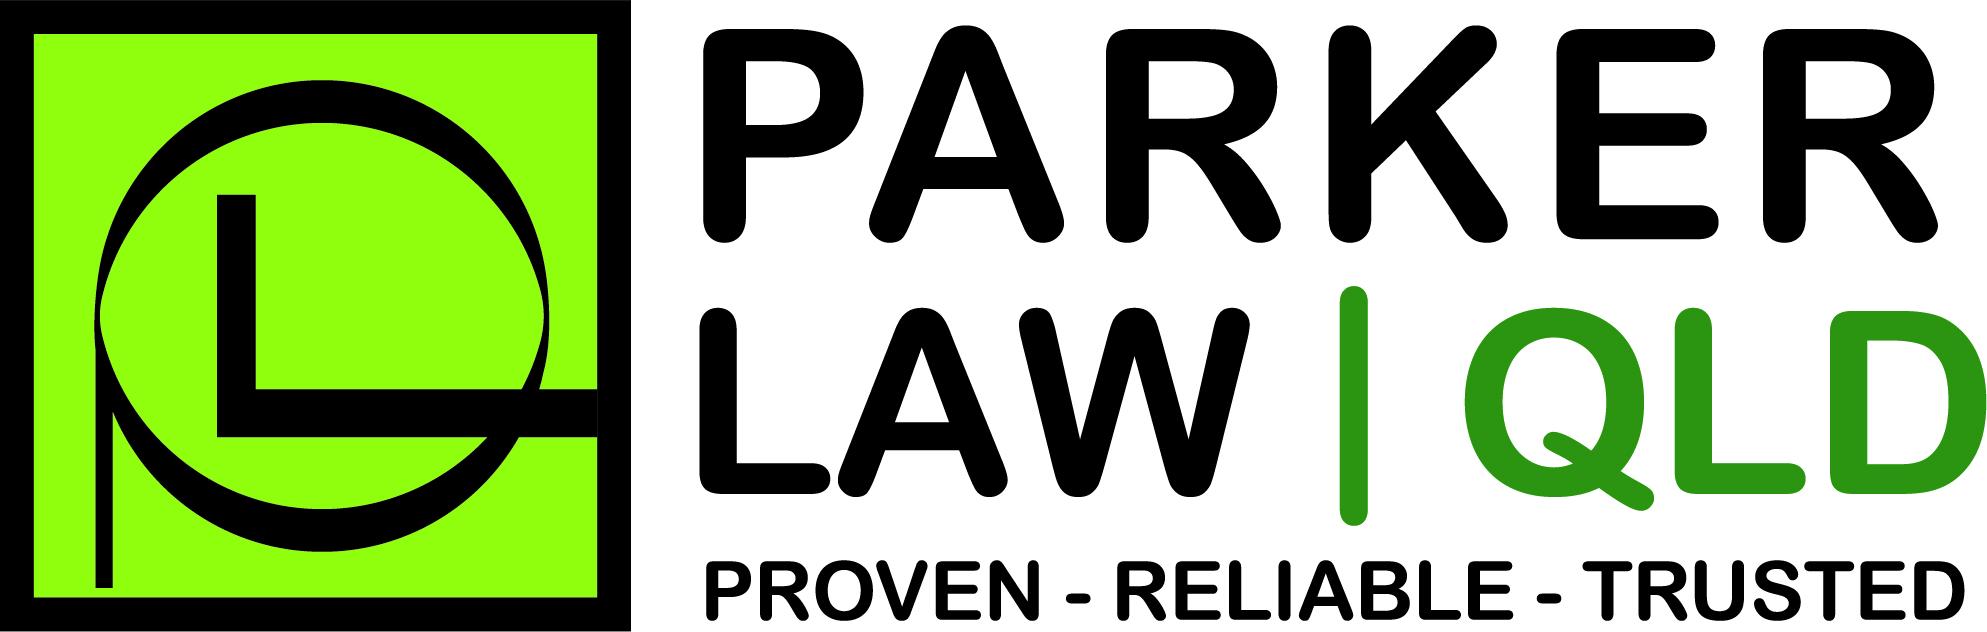 Parker Law Qld